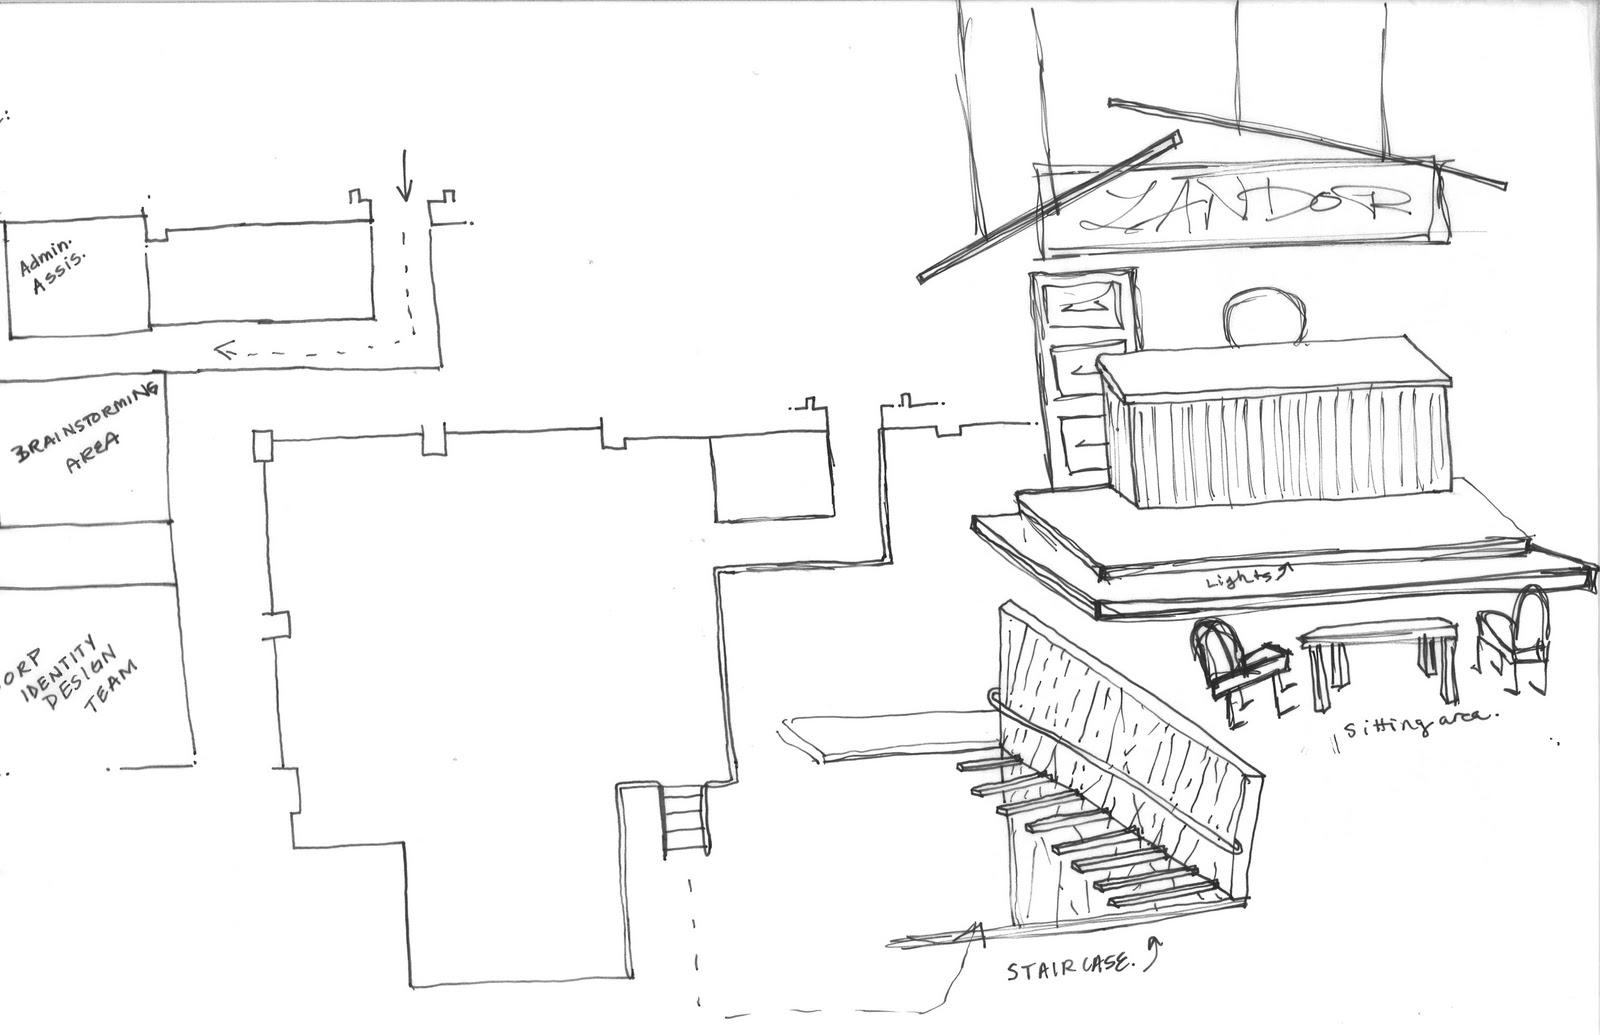 Landor Office Design Project Process Work